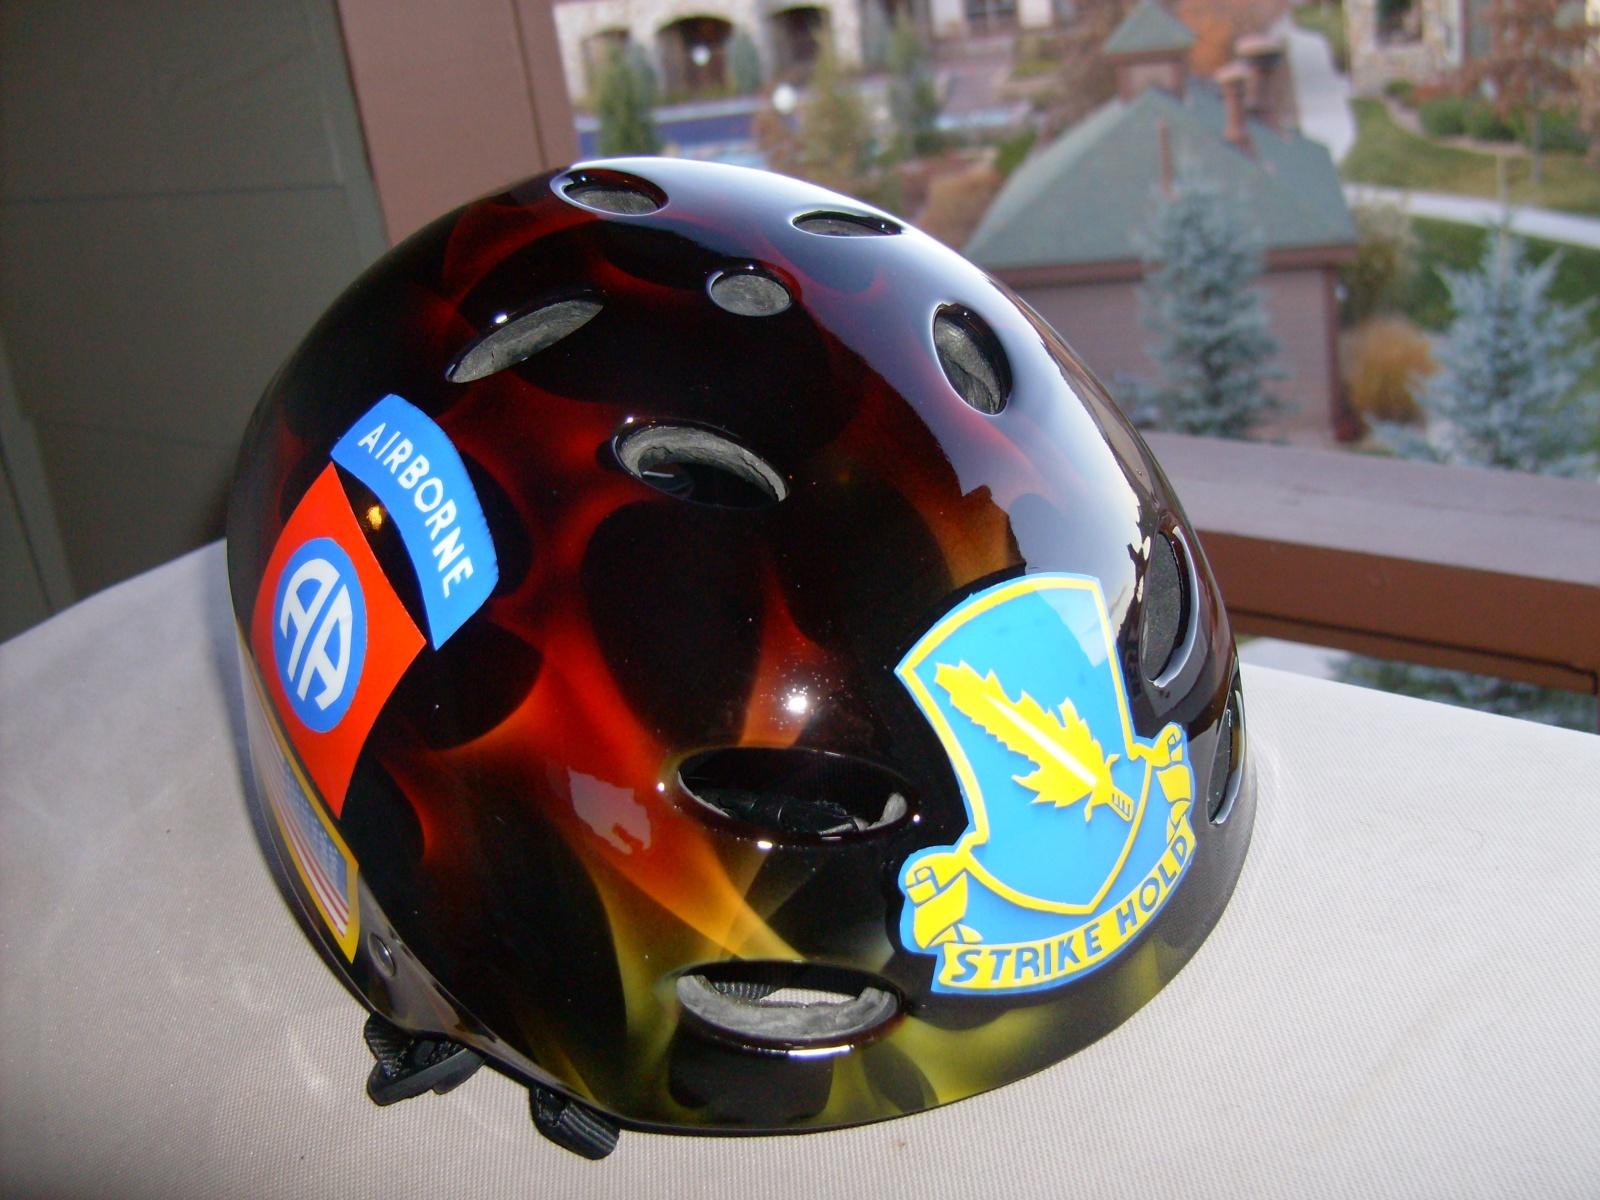 Click image for larger version  Name:Custom kayak helmet 001.jpg Views:385 Size:528.5 KB ID:843